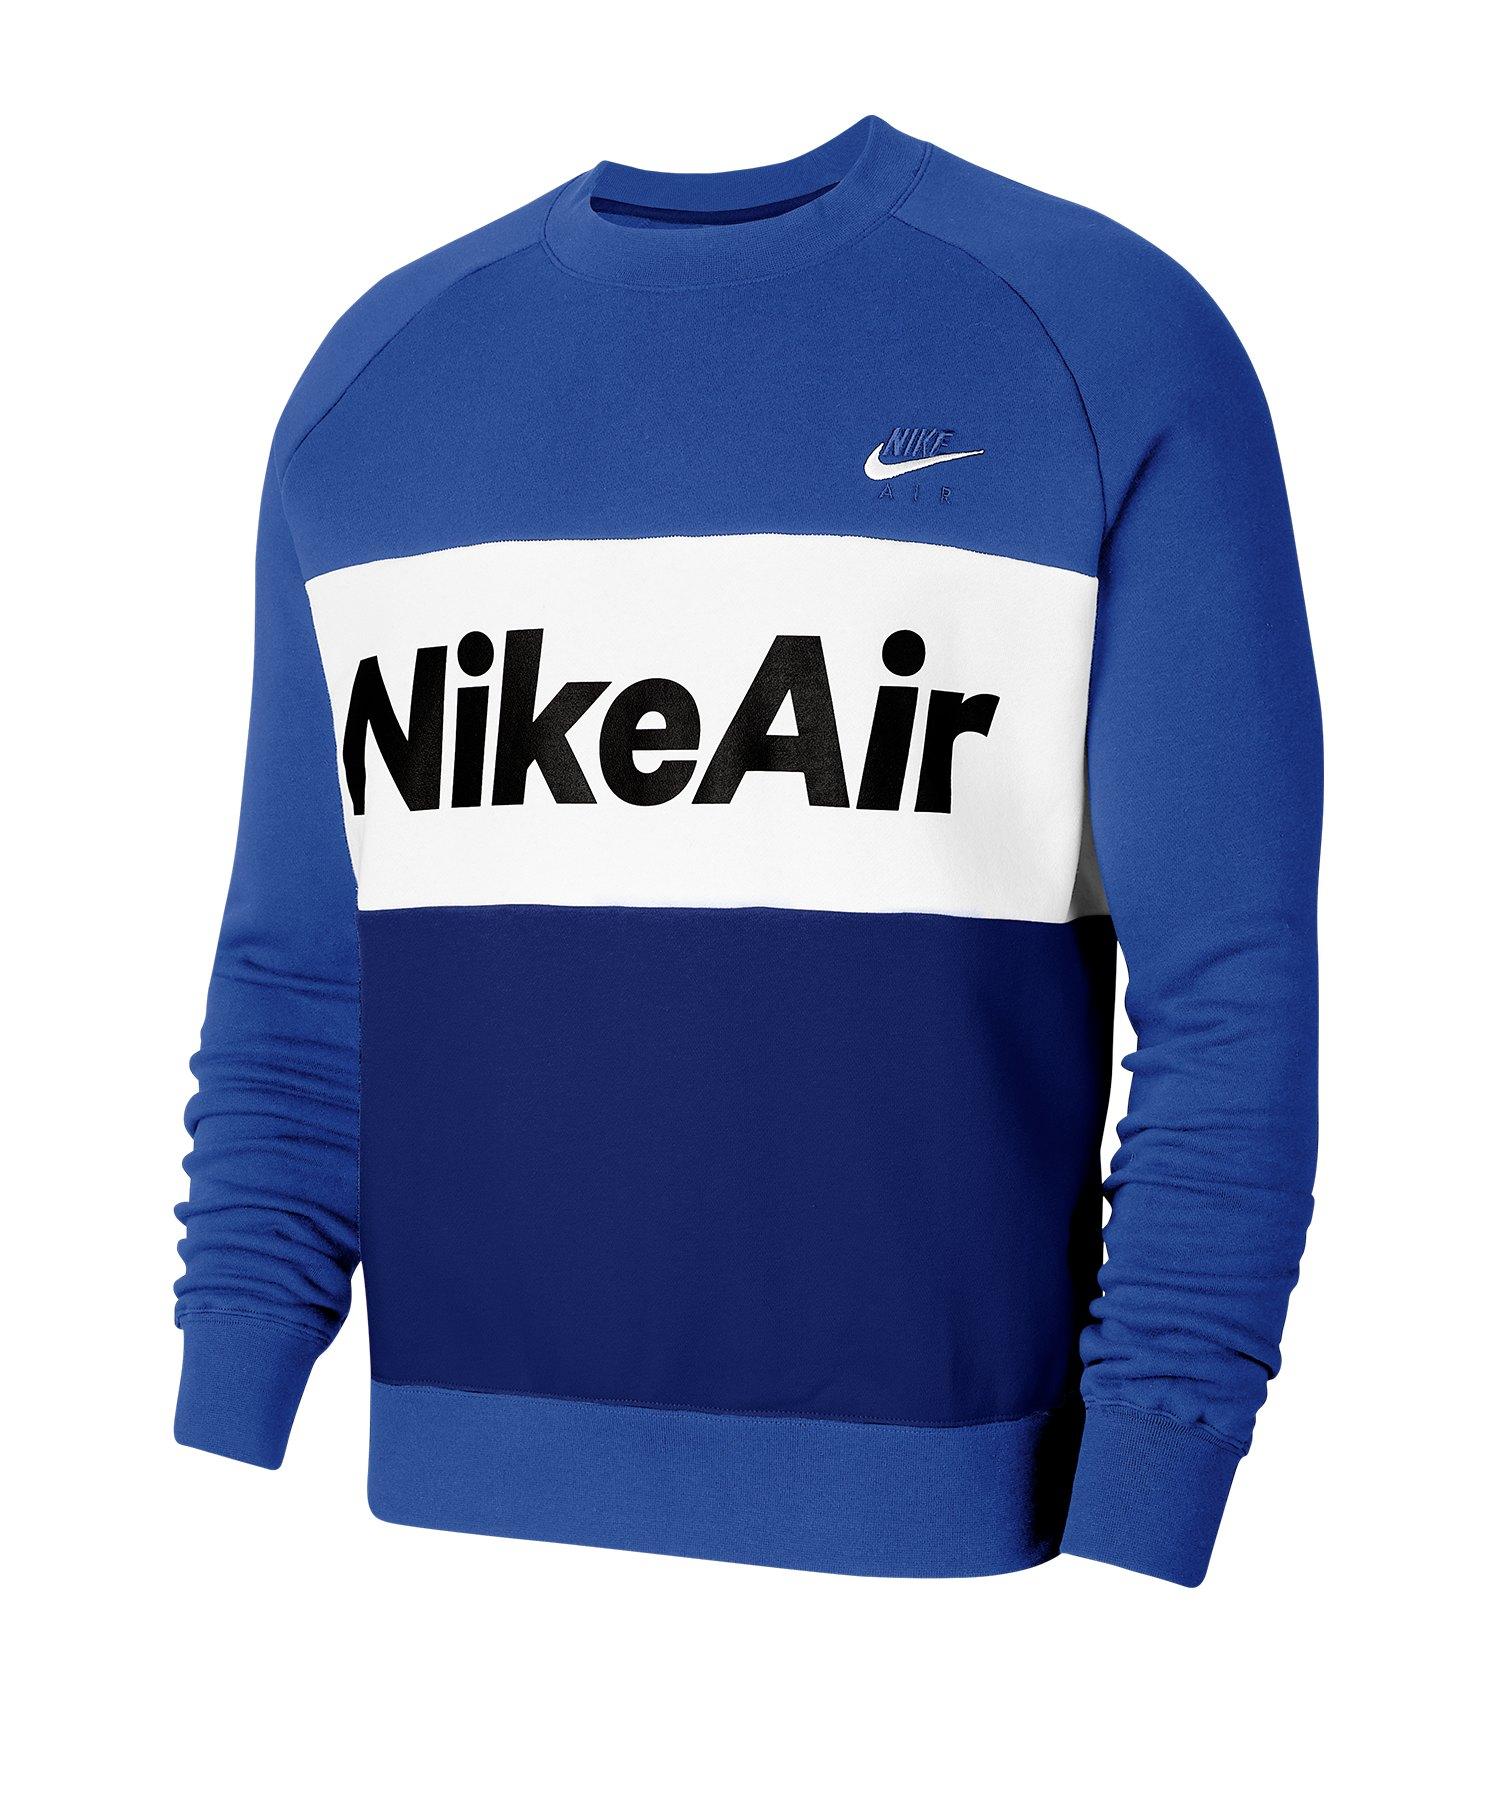 Nike Air Fleece Crew Sweatshirt Blau F480 - blau